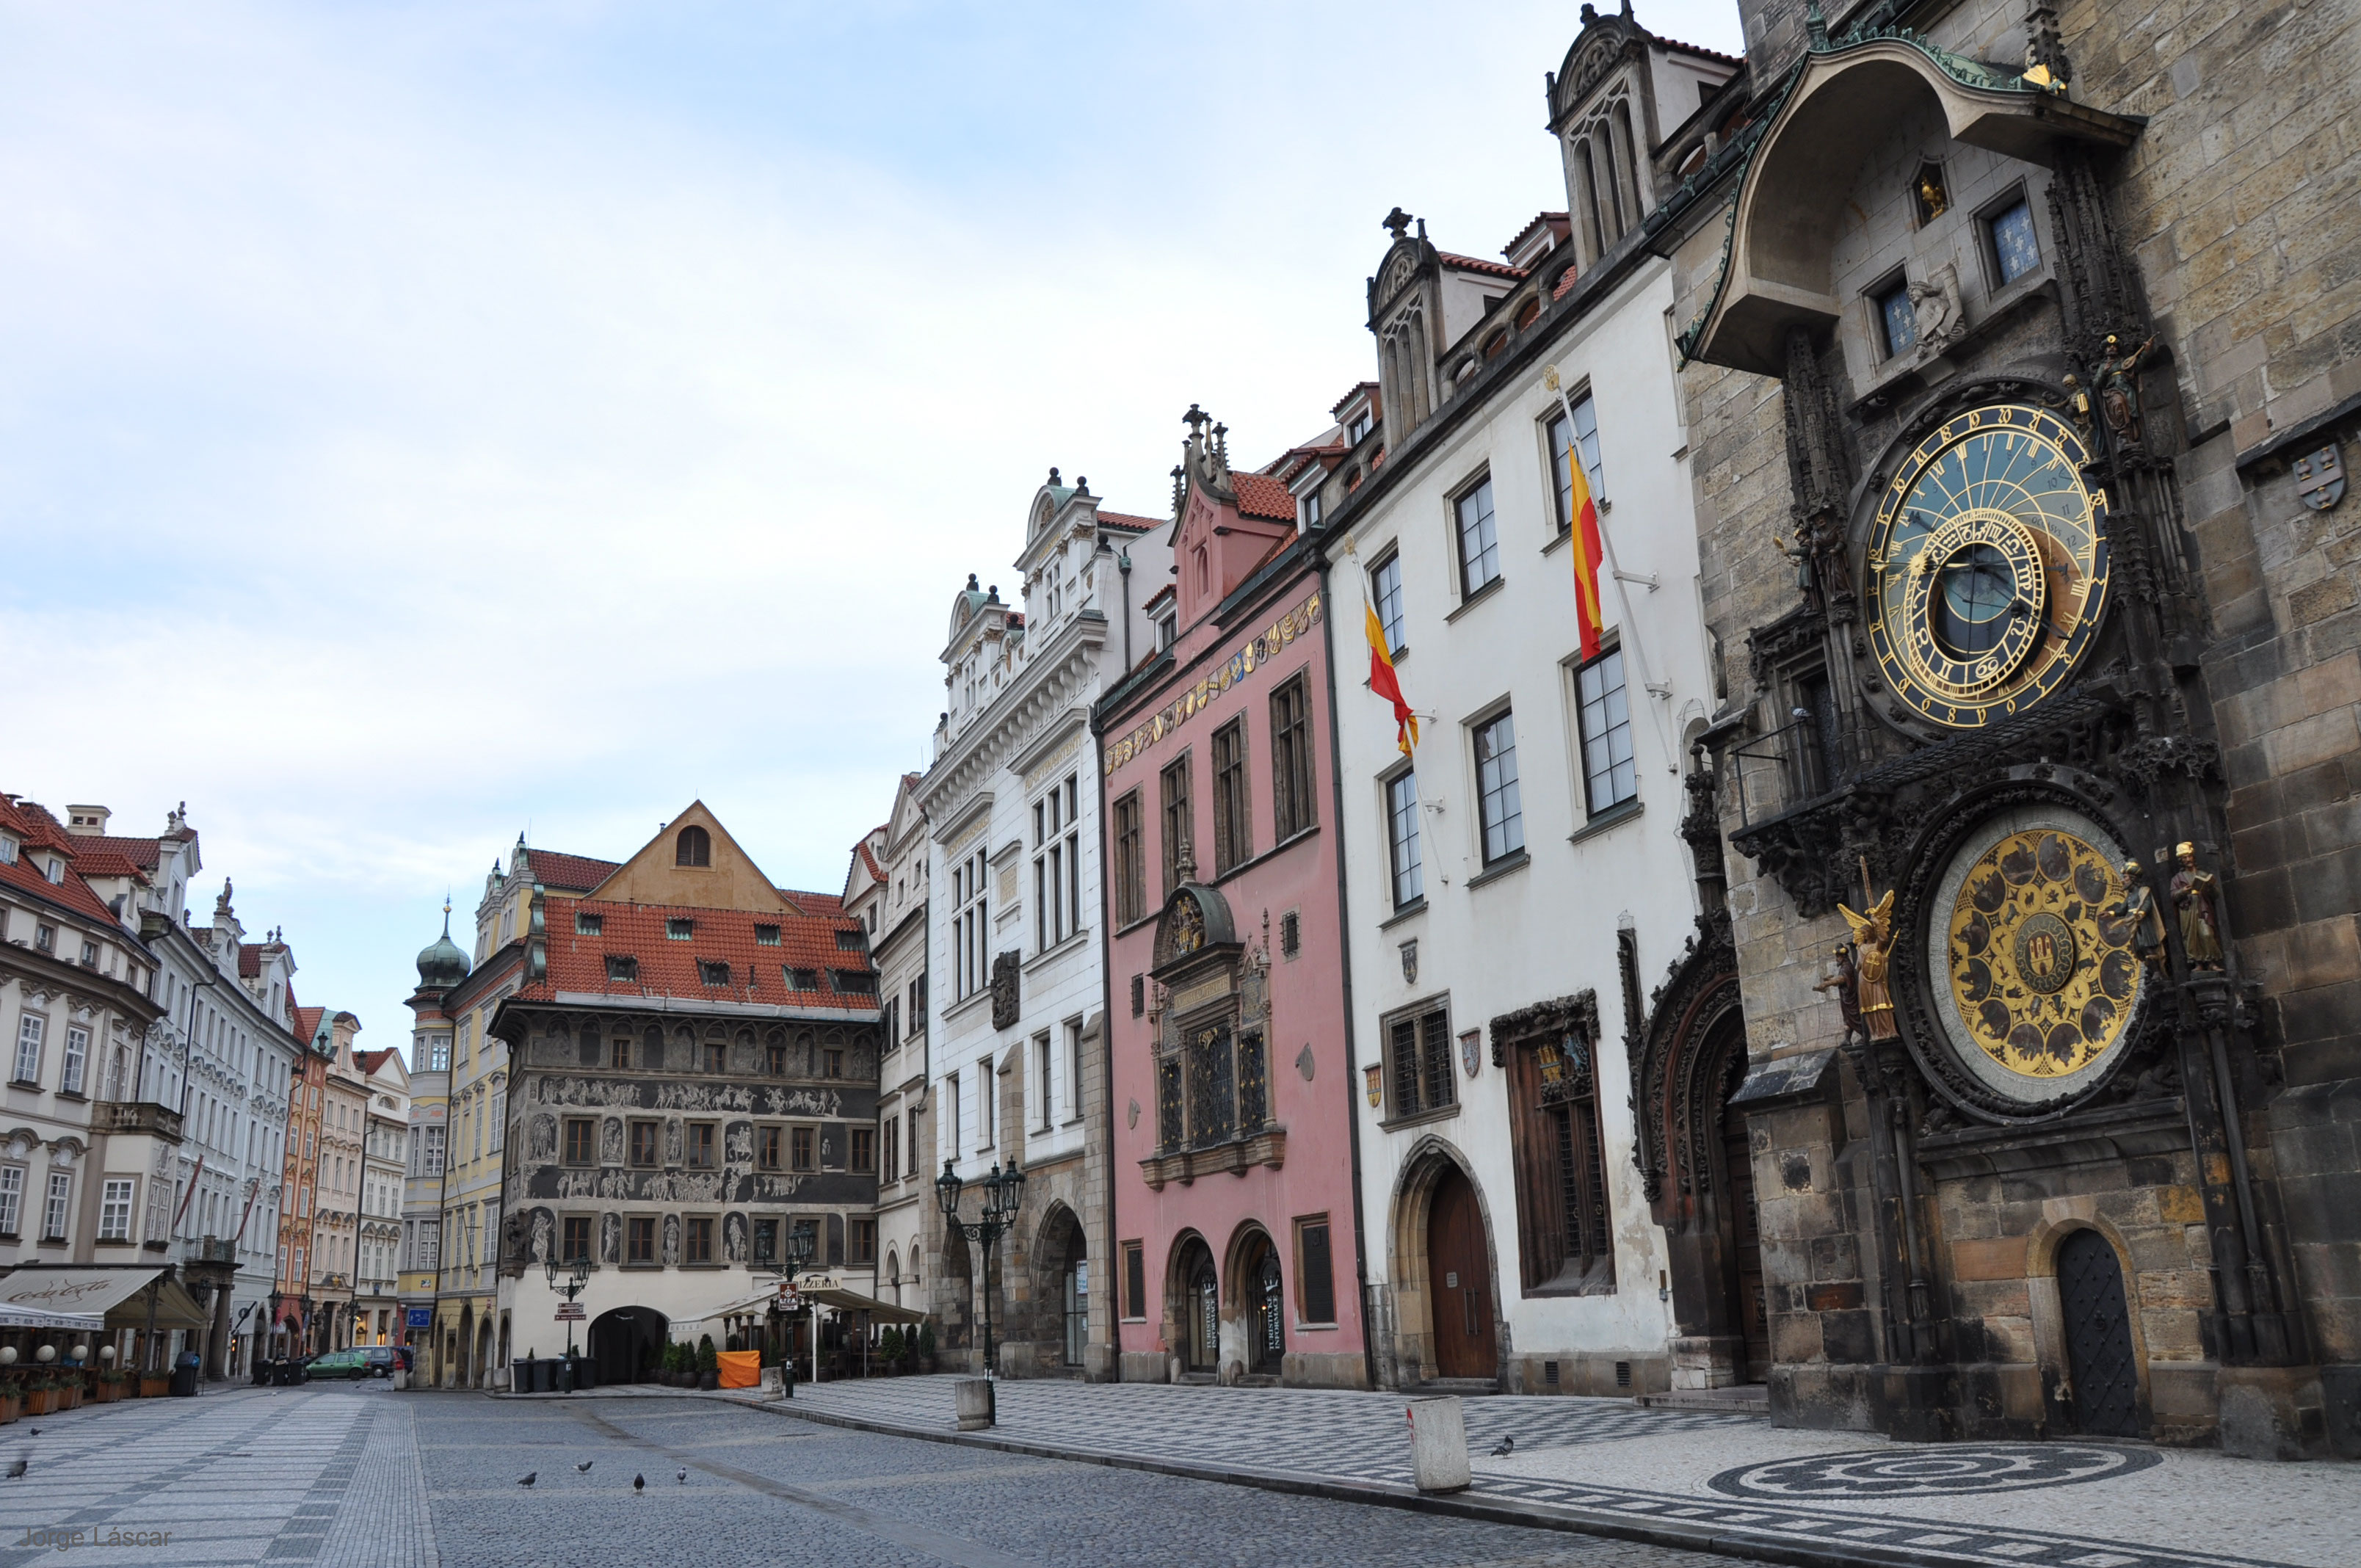 APOD: 2017 November 7 - The Prague Astronomical Clock